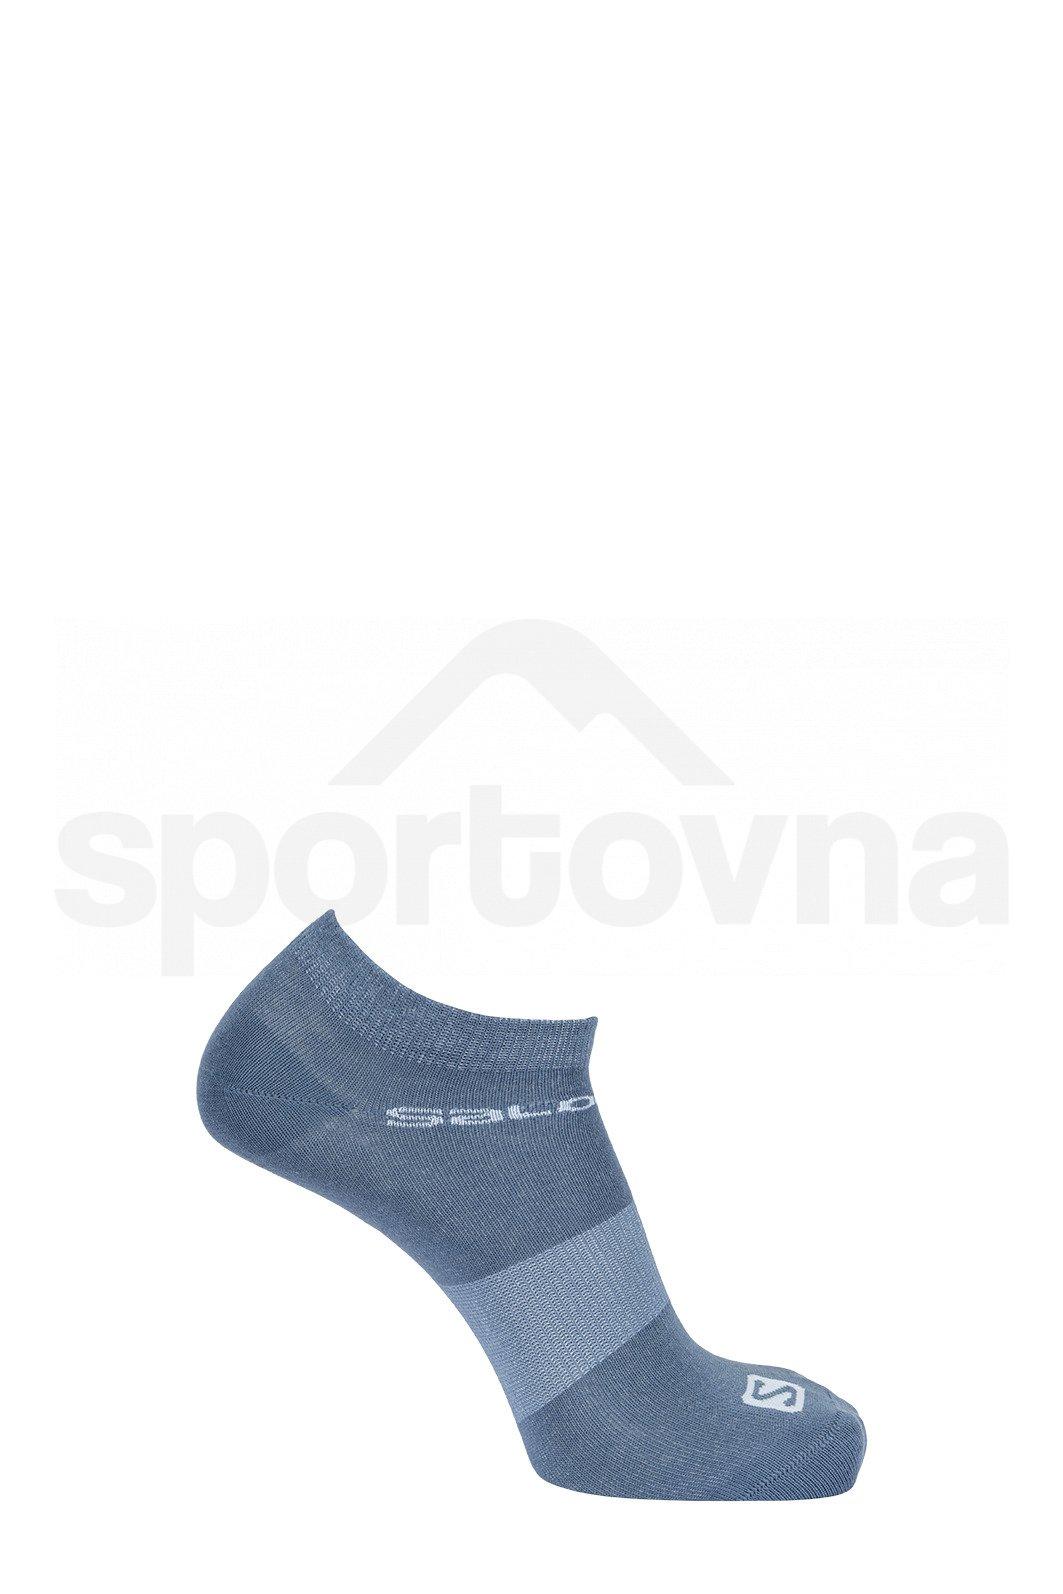 Ponožky Salomon FESTIVAL 2-PACK - modrá